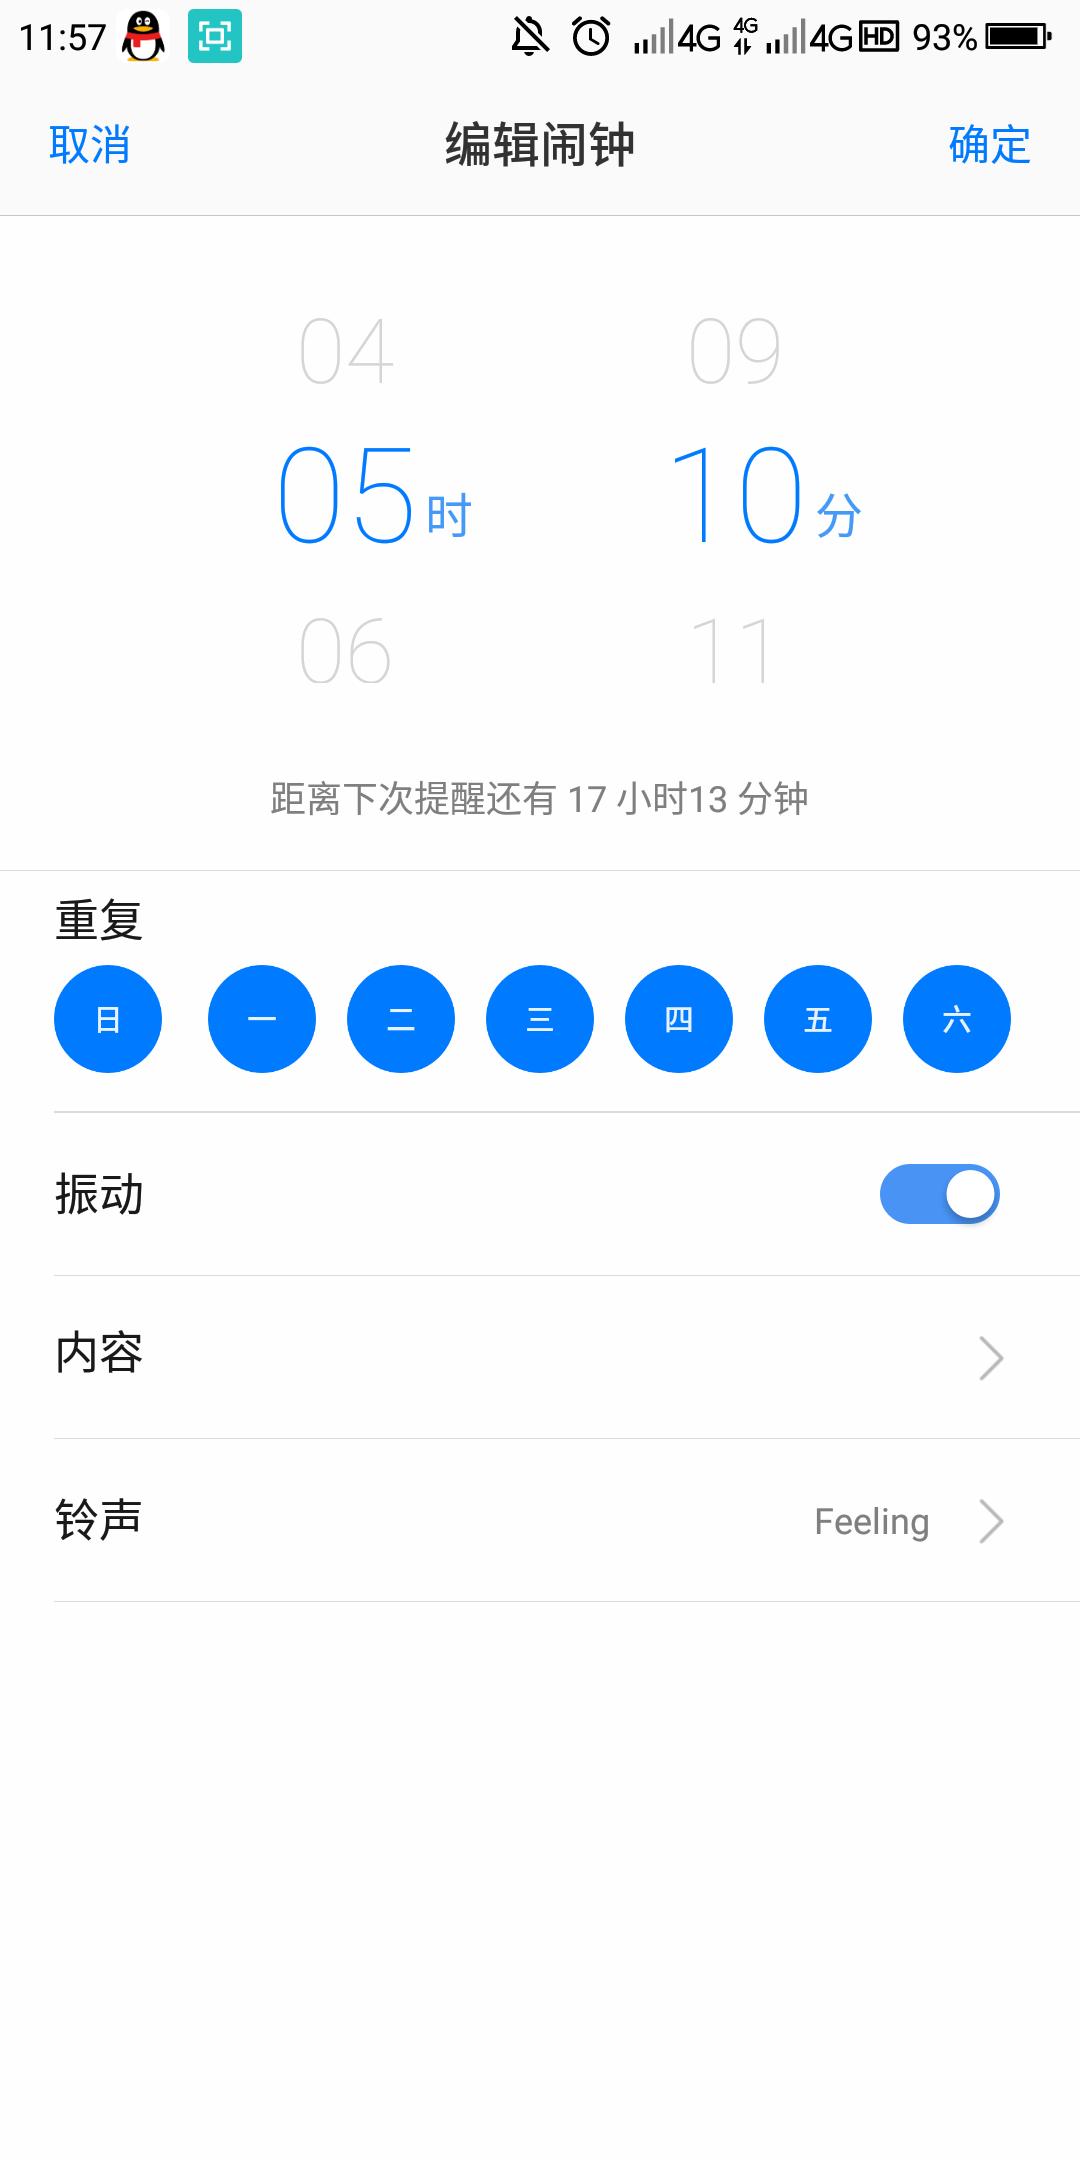 Screenshot_2019-03-11-11-57-34.png